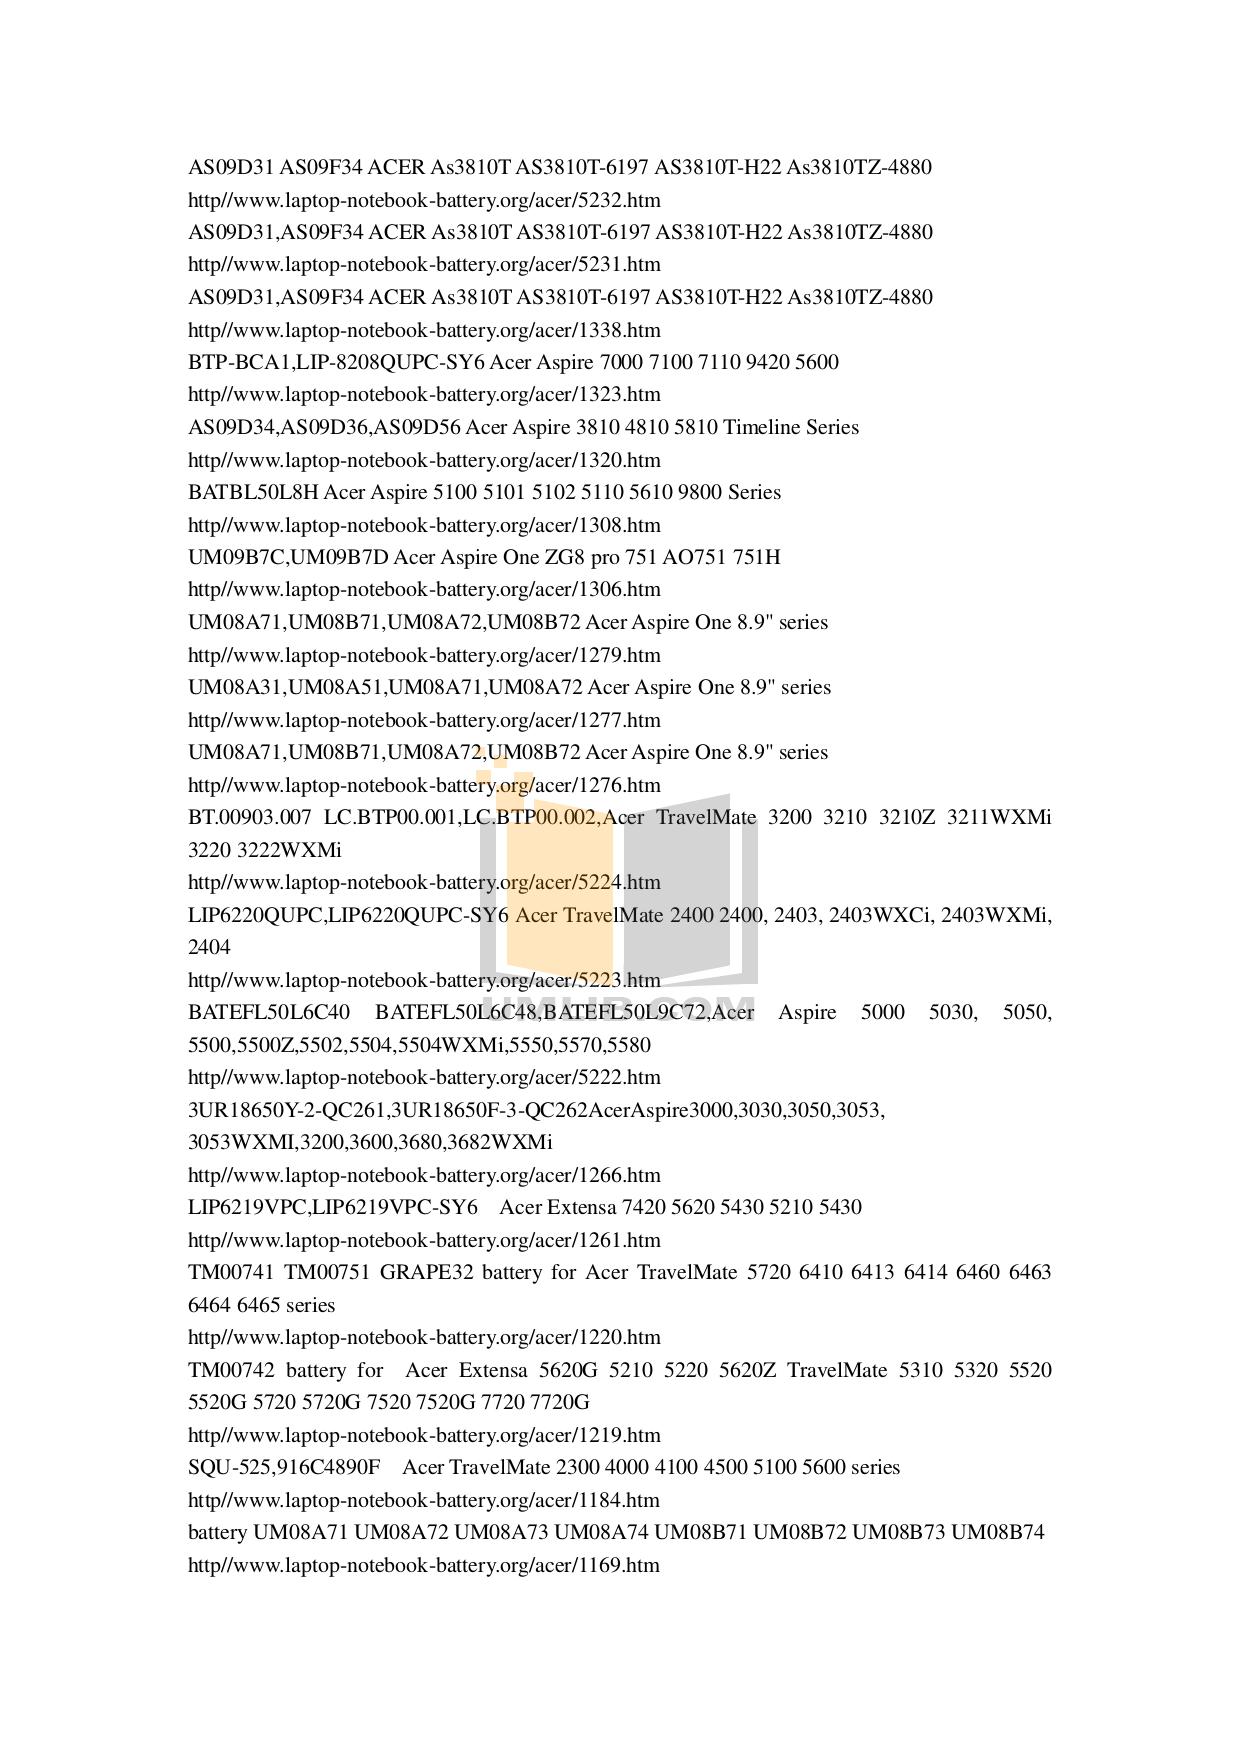 pdf for HP Laptop Pavilion HDX X16-1160 manual